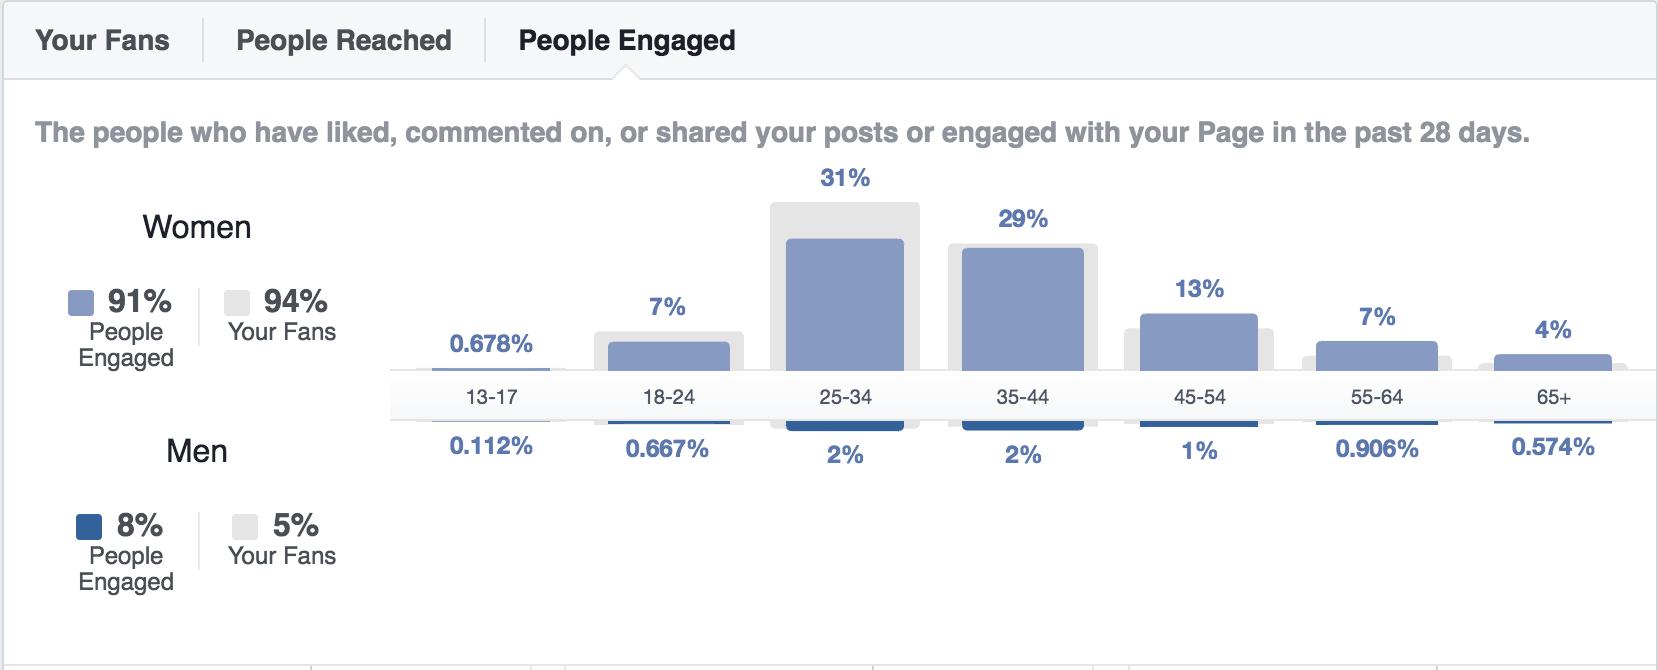 Facebook People Engaged